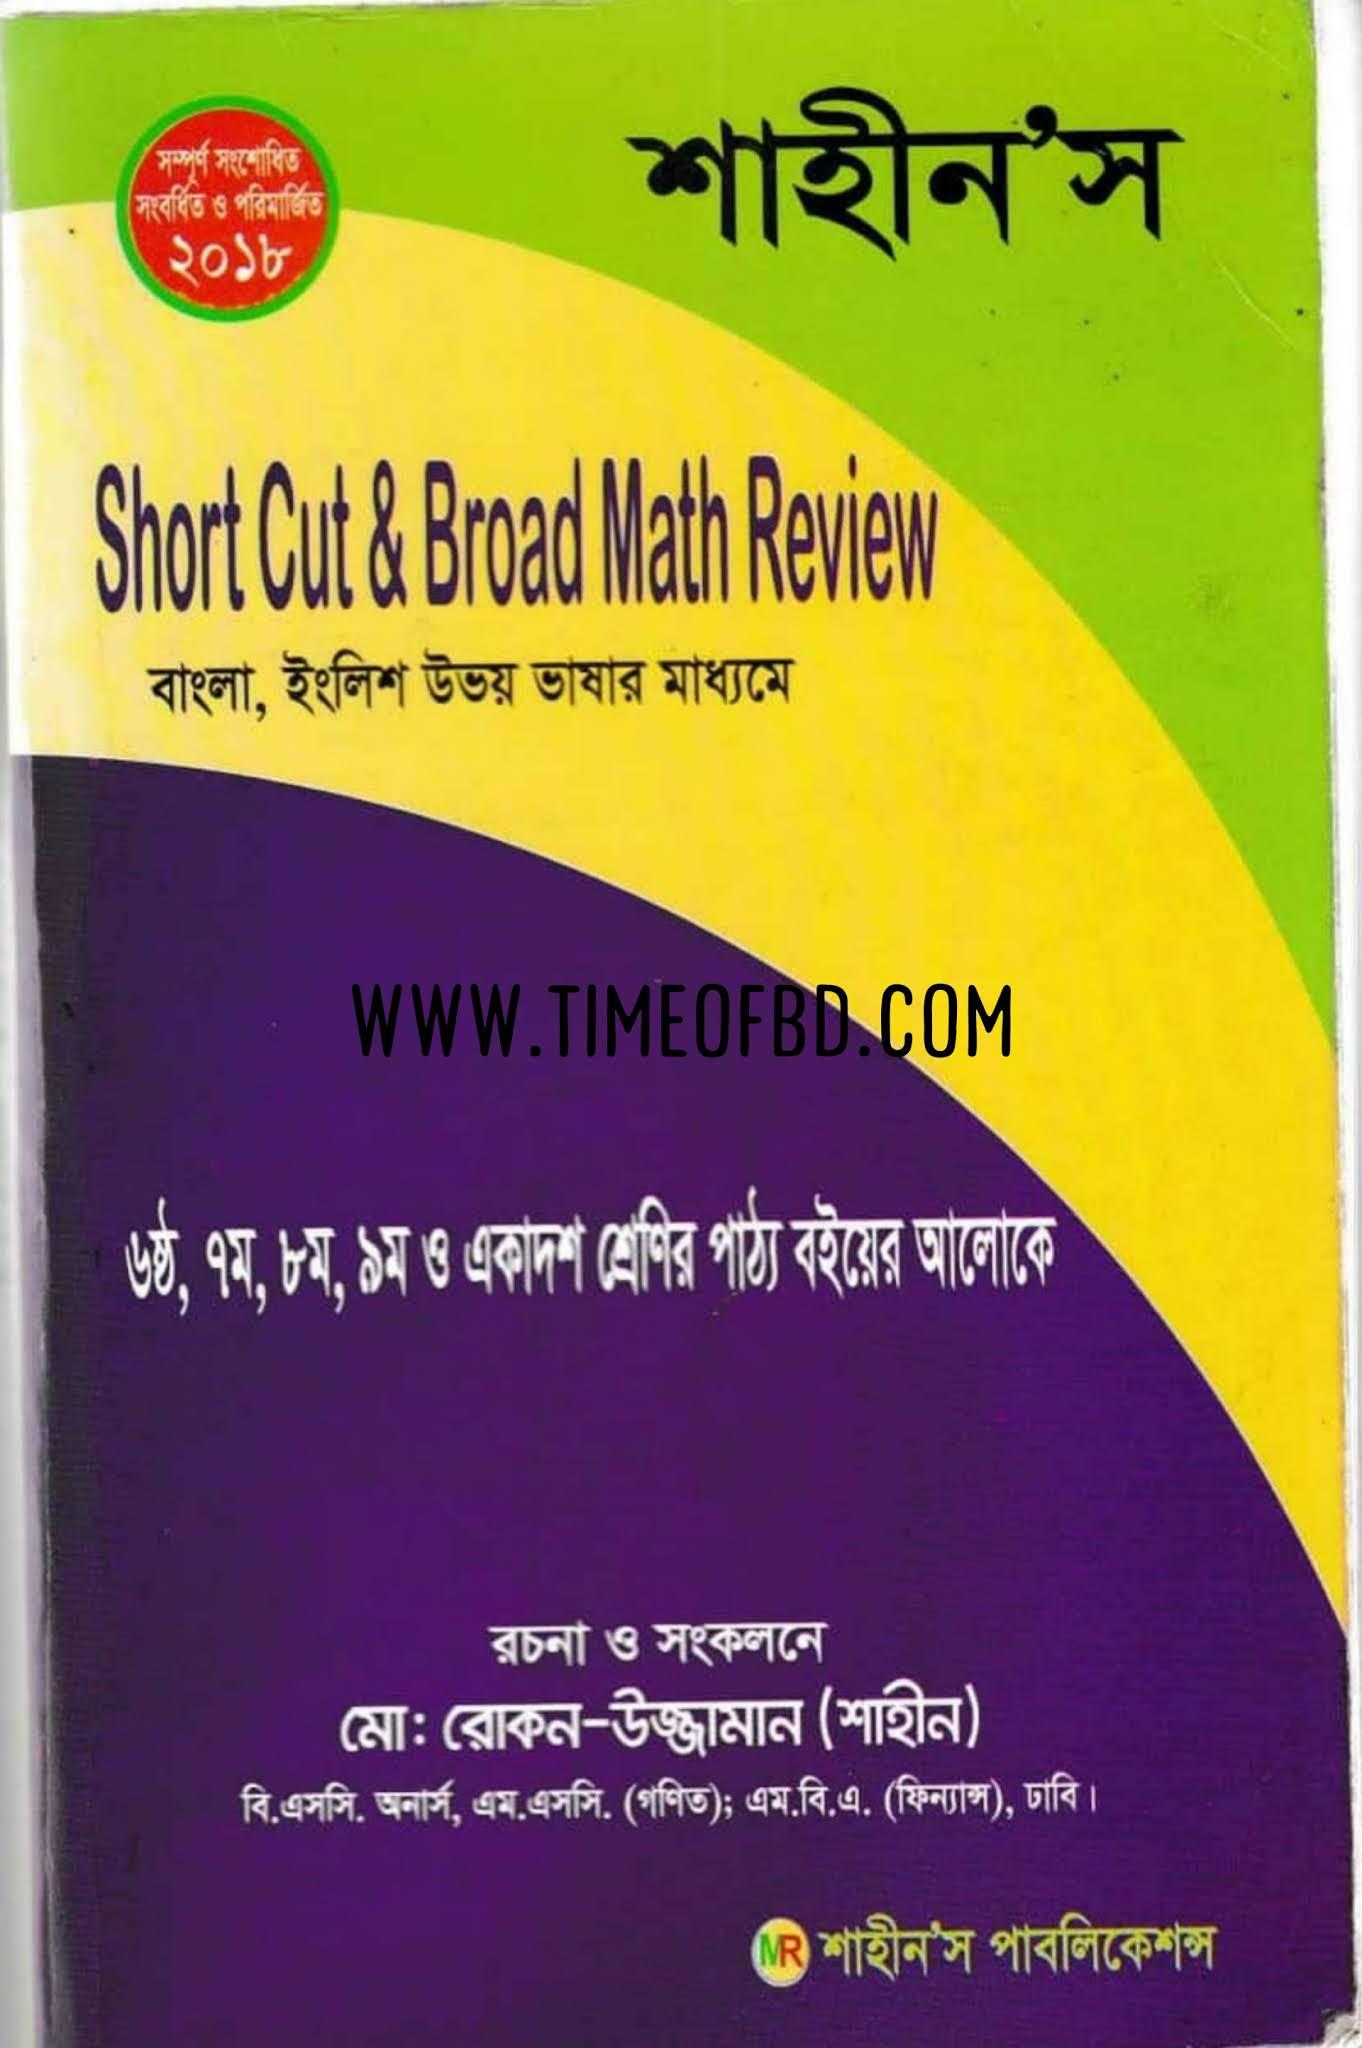 shahin's math pdf file download link, shahin's math pdf file download,shahin's math pdf file download, shahin's math pdf